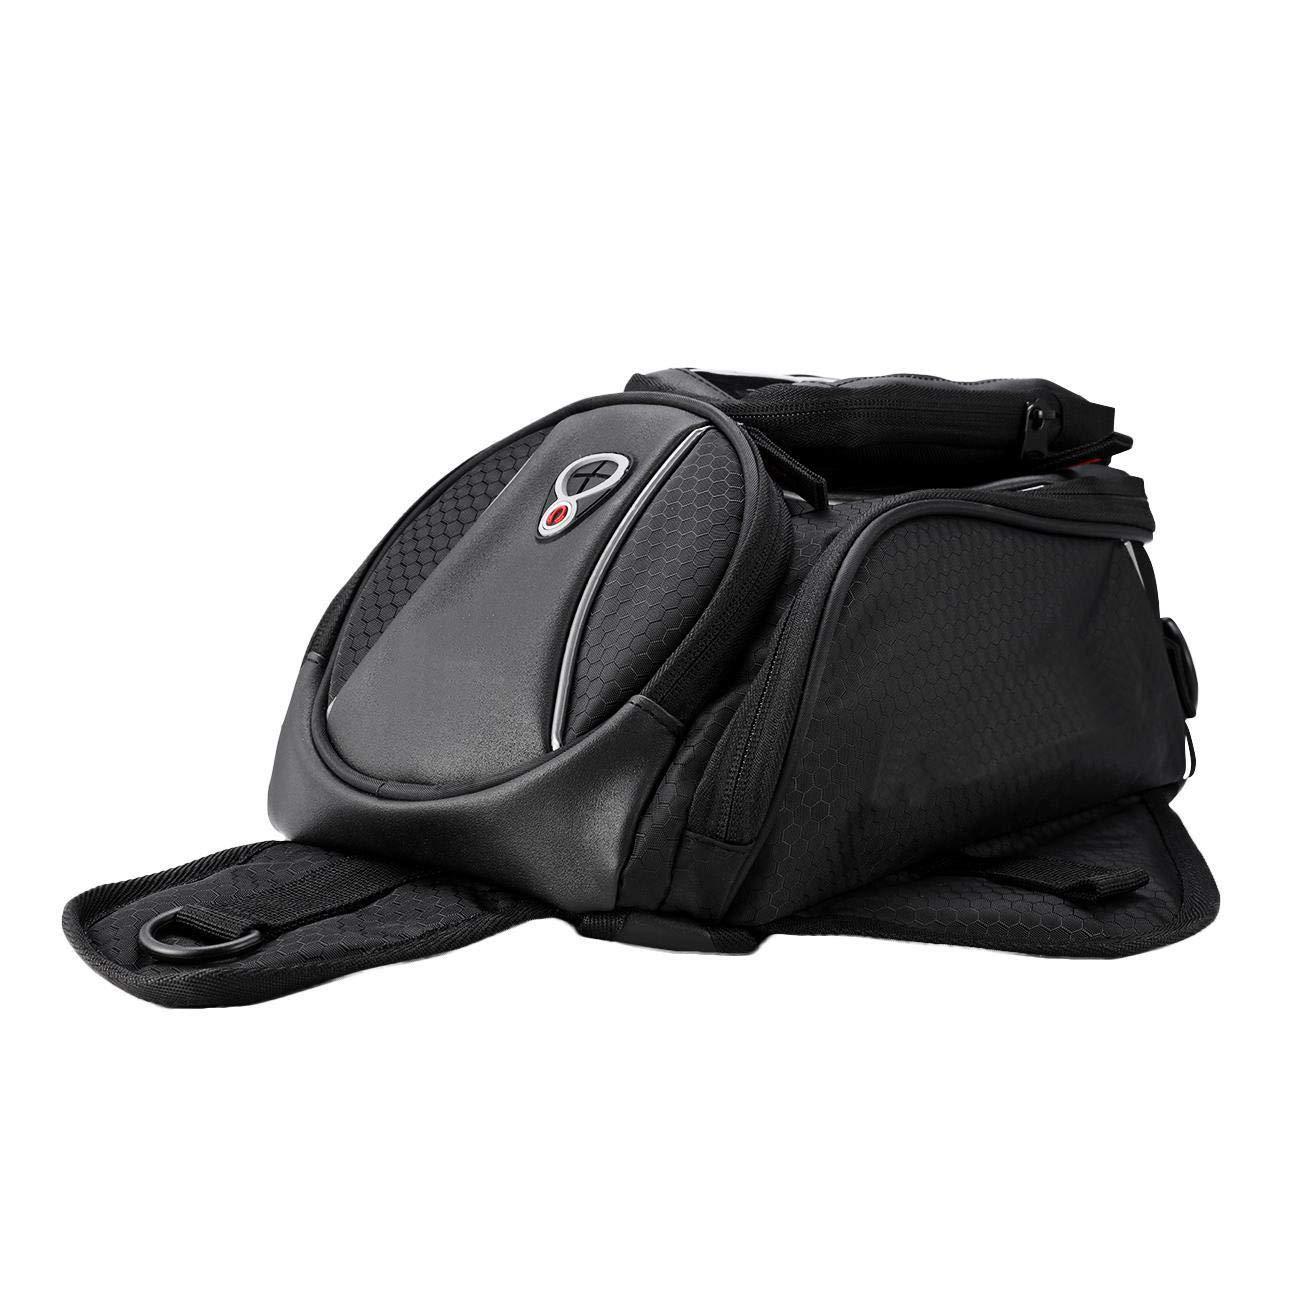 INNOGLOW Black Universal 800DPU waterproof oxford cloth Motorcycle Sport Bike Riding Fuel Gas Tank Helmet Waterproof Bag Backpack fit for Harley, Honda, Yamaha, Suzuki, Kawasaki, Triumph